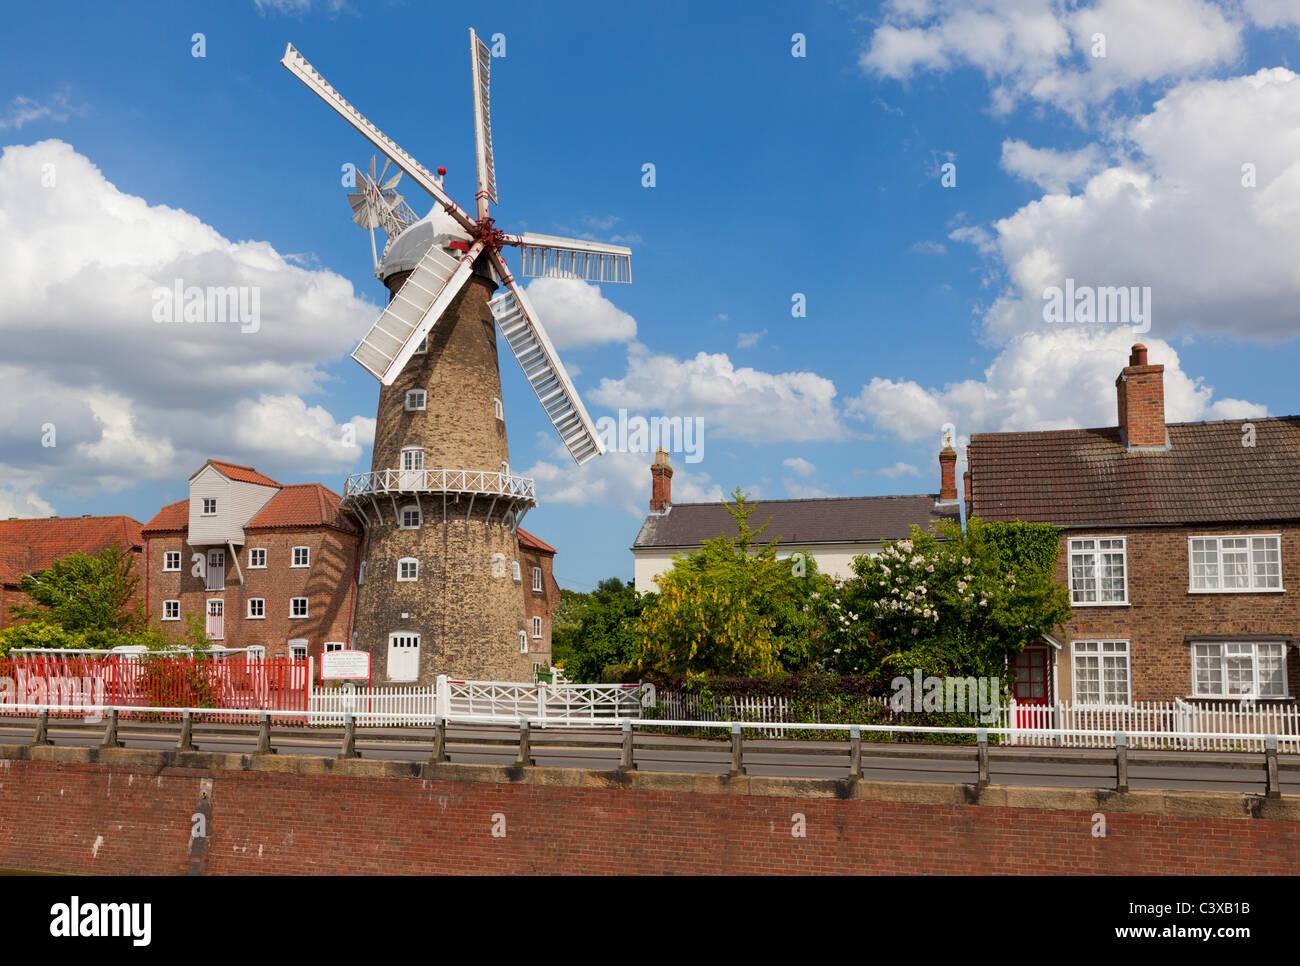 Maud Foster moulin à côté du drain Foster Maud Skirbeck Boston LIncolnshire Angleterre GO UK EU Europe Photo Stock